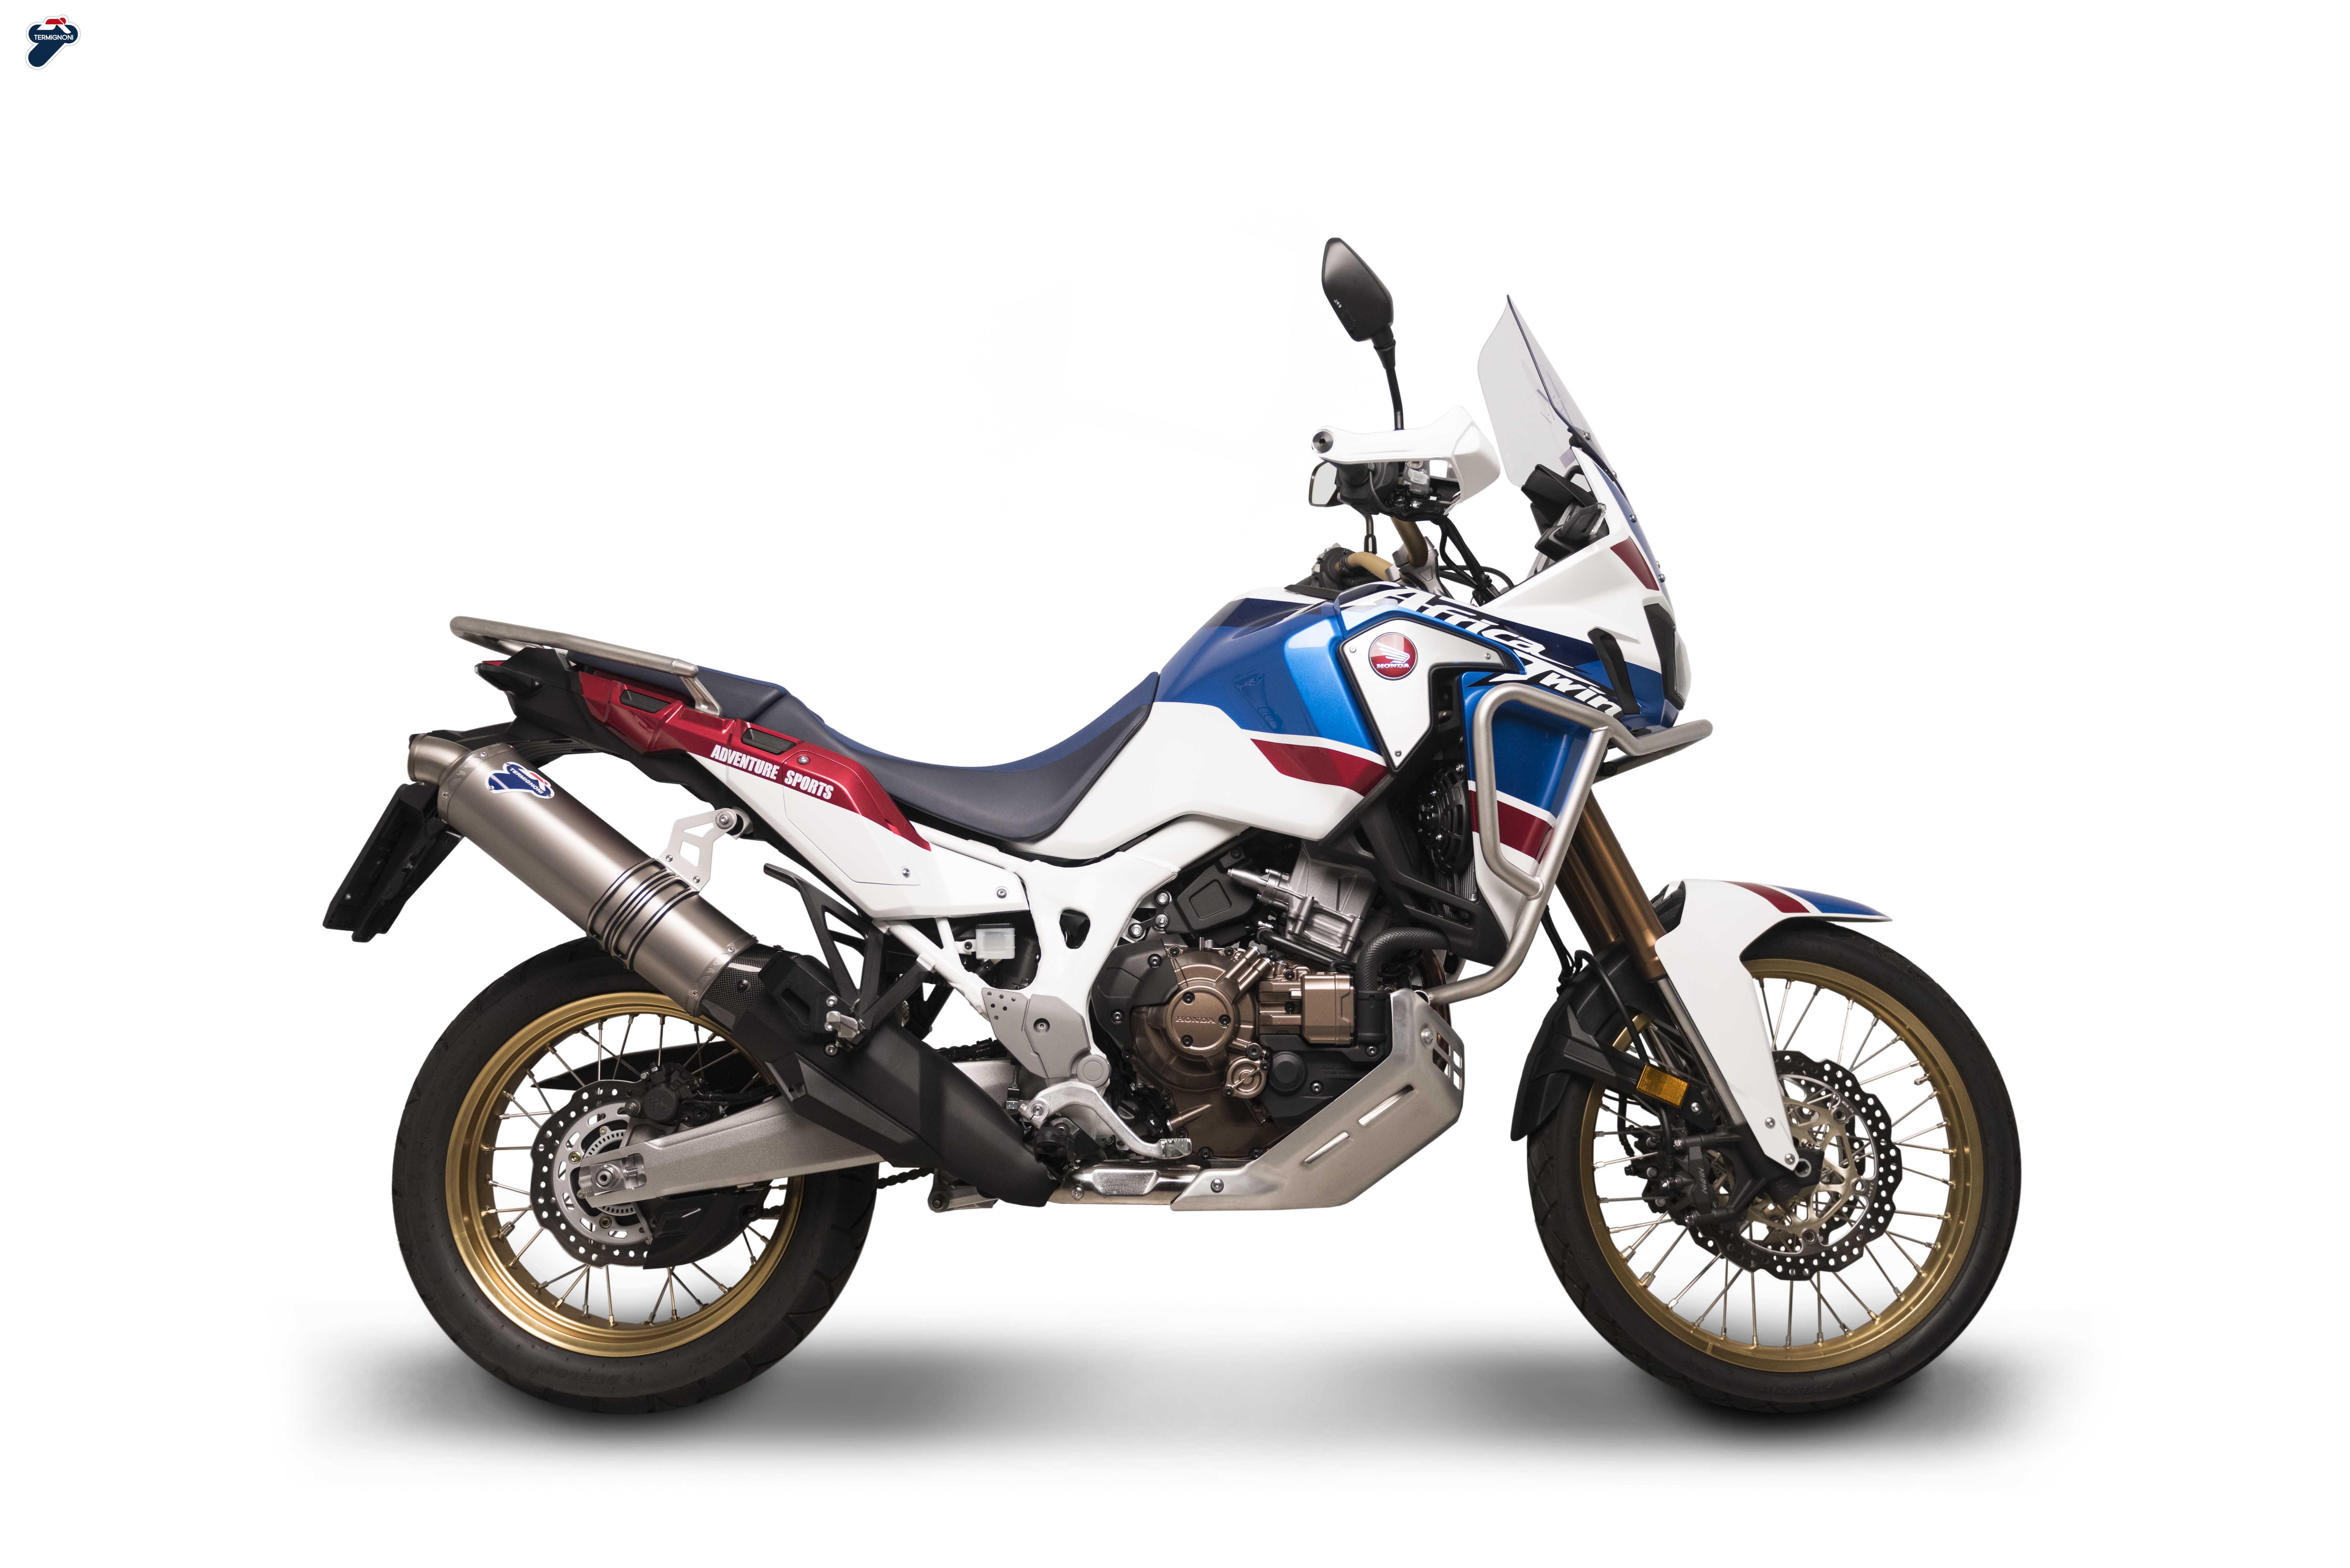 Termignoni Auspuff Slip On Honda Crf 1000 L Africa Twin Adventure Sports 17 19 Jamparts